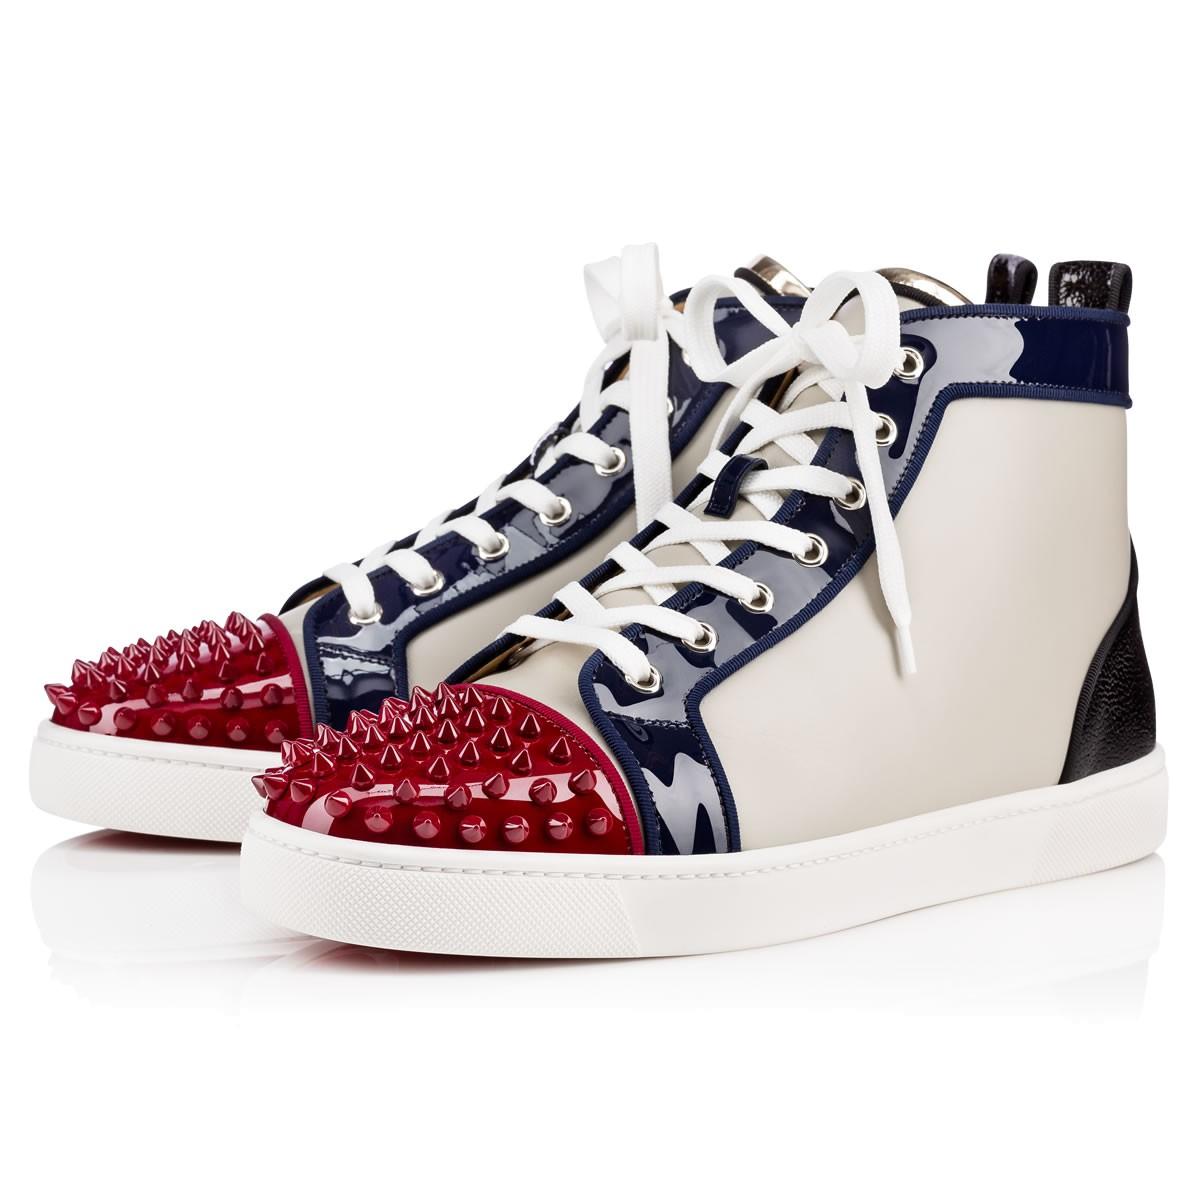 ... switzerland christian louboutin lou spikes patent calf caviar  multicolor calfskin men shoes 7801d 6833f